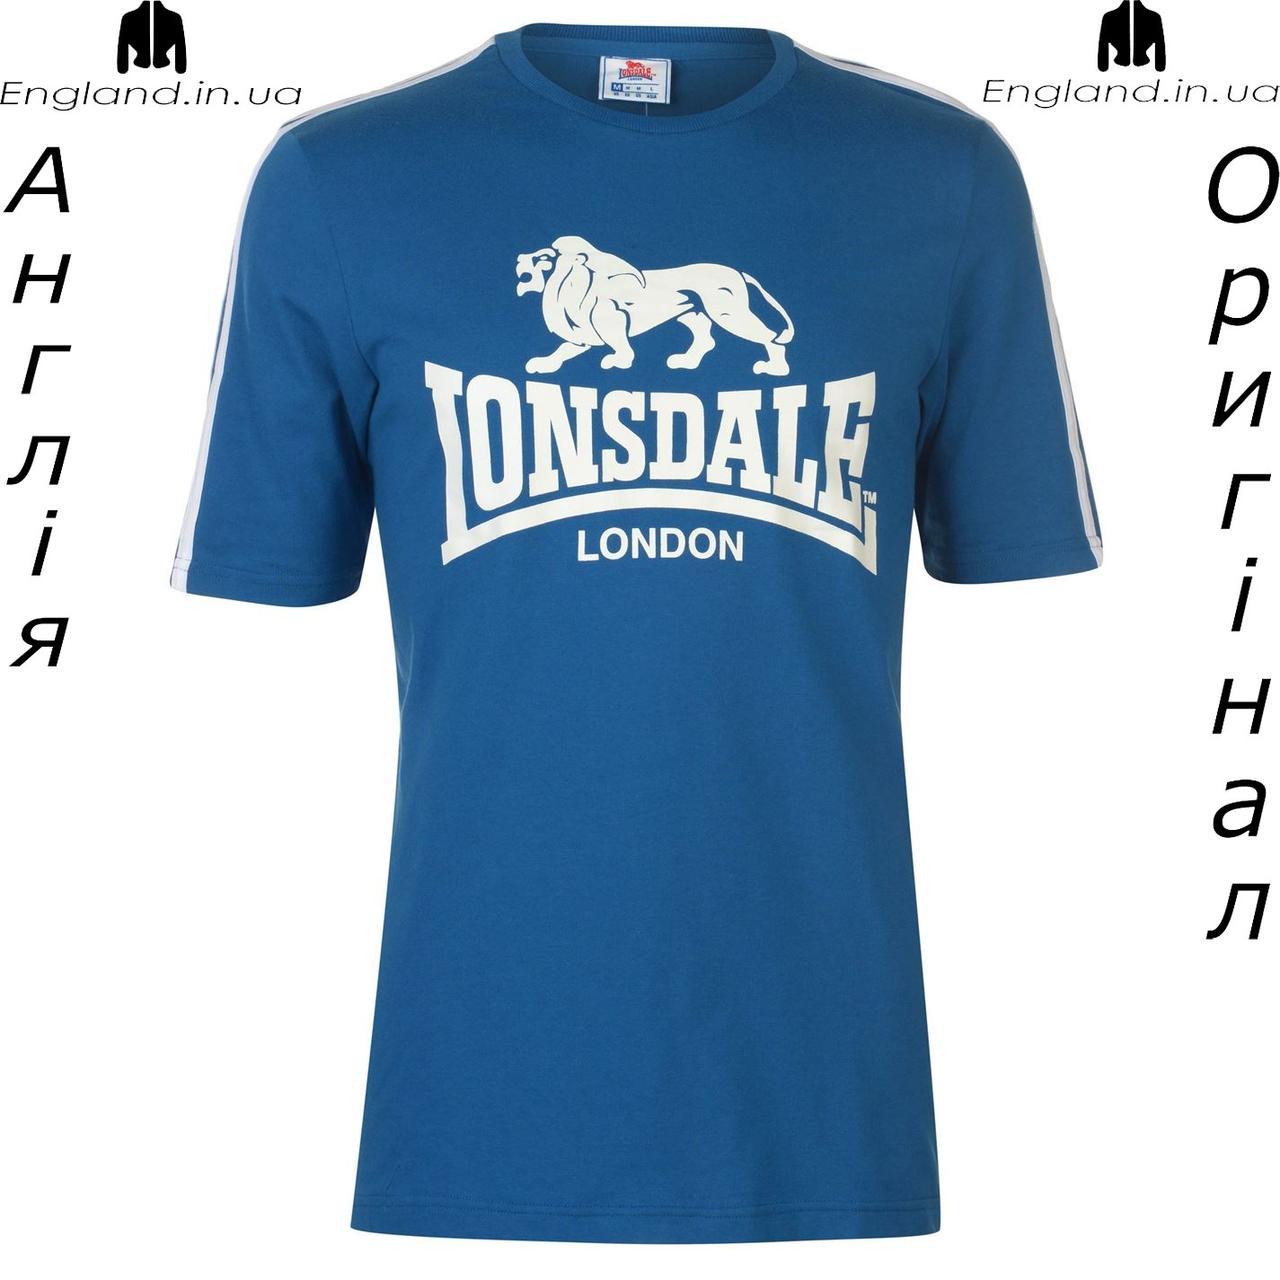 Футболка мужская Lonsdale из Англии